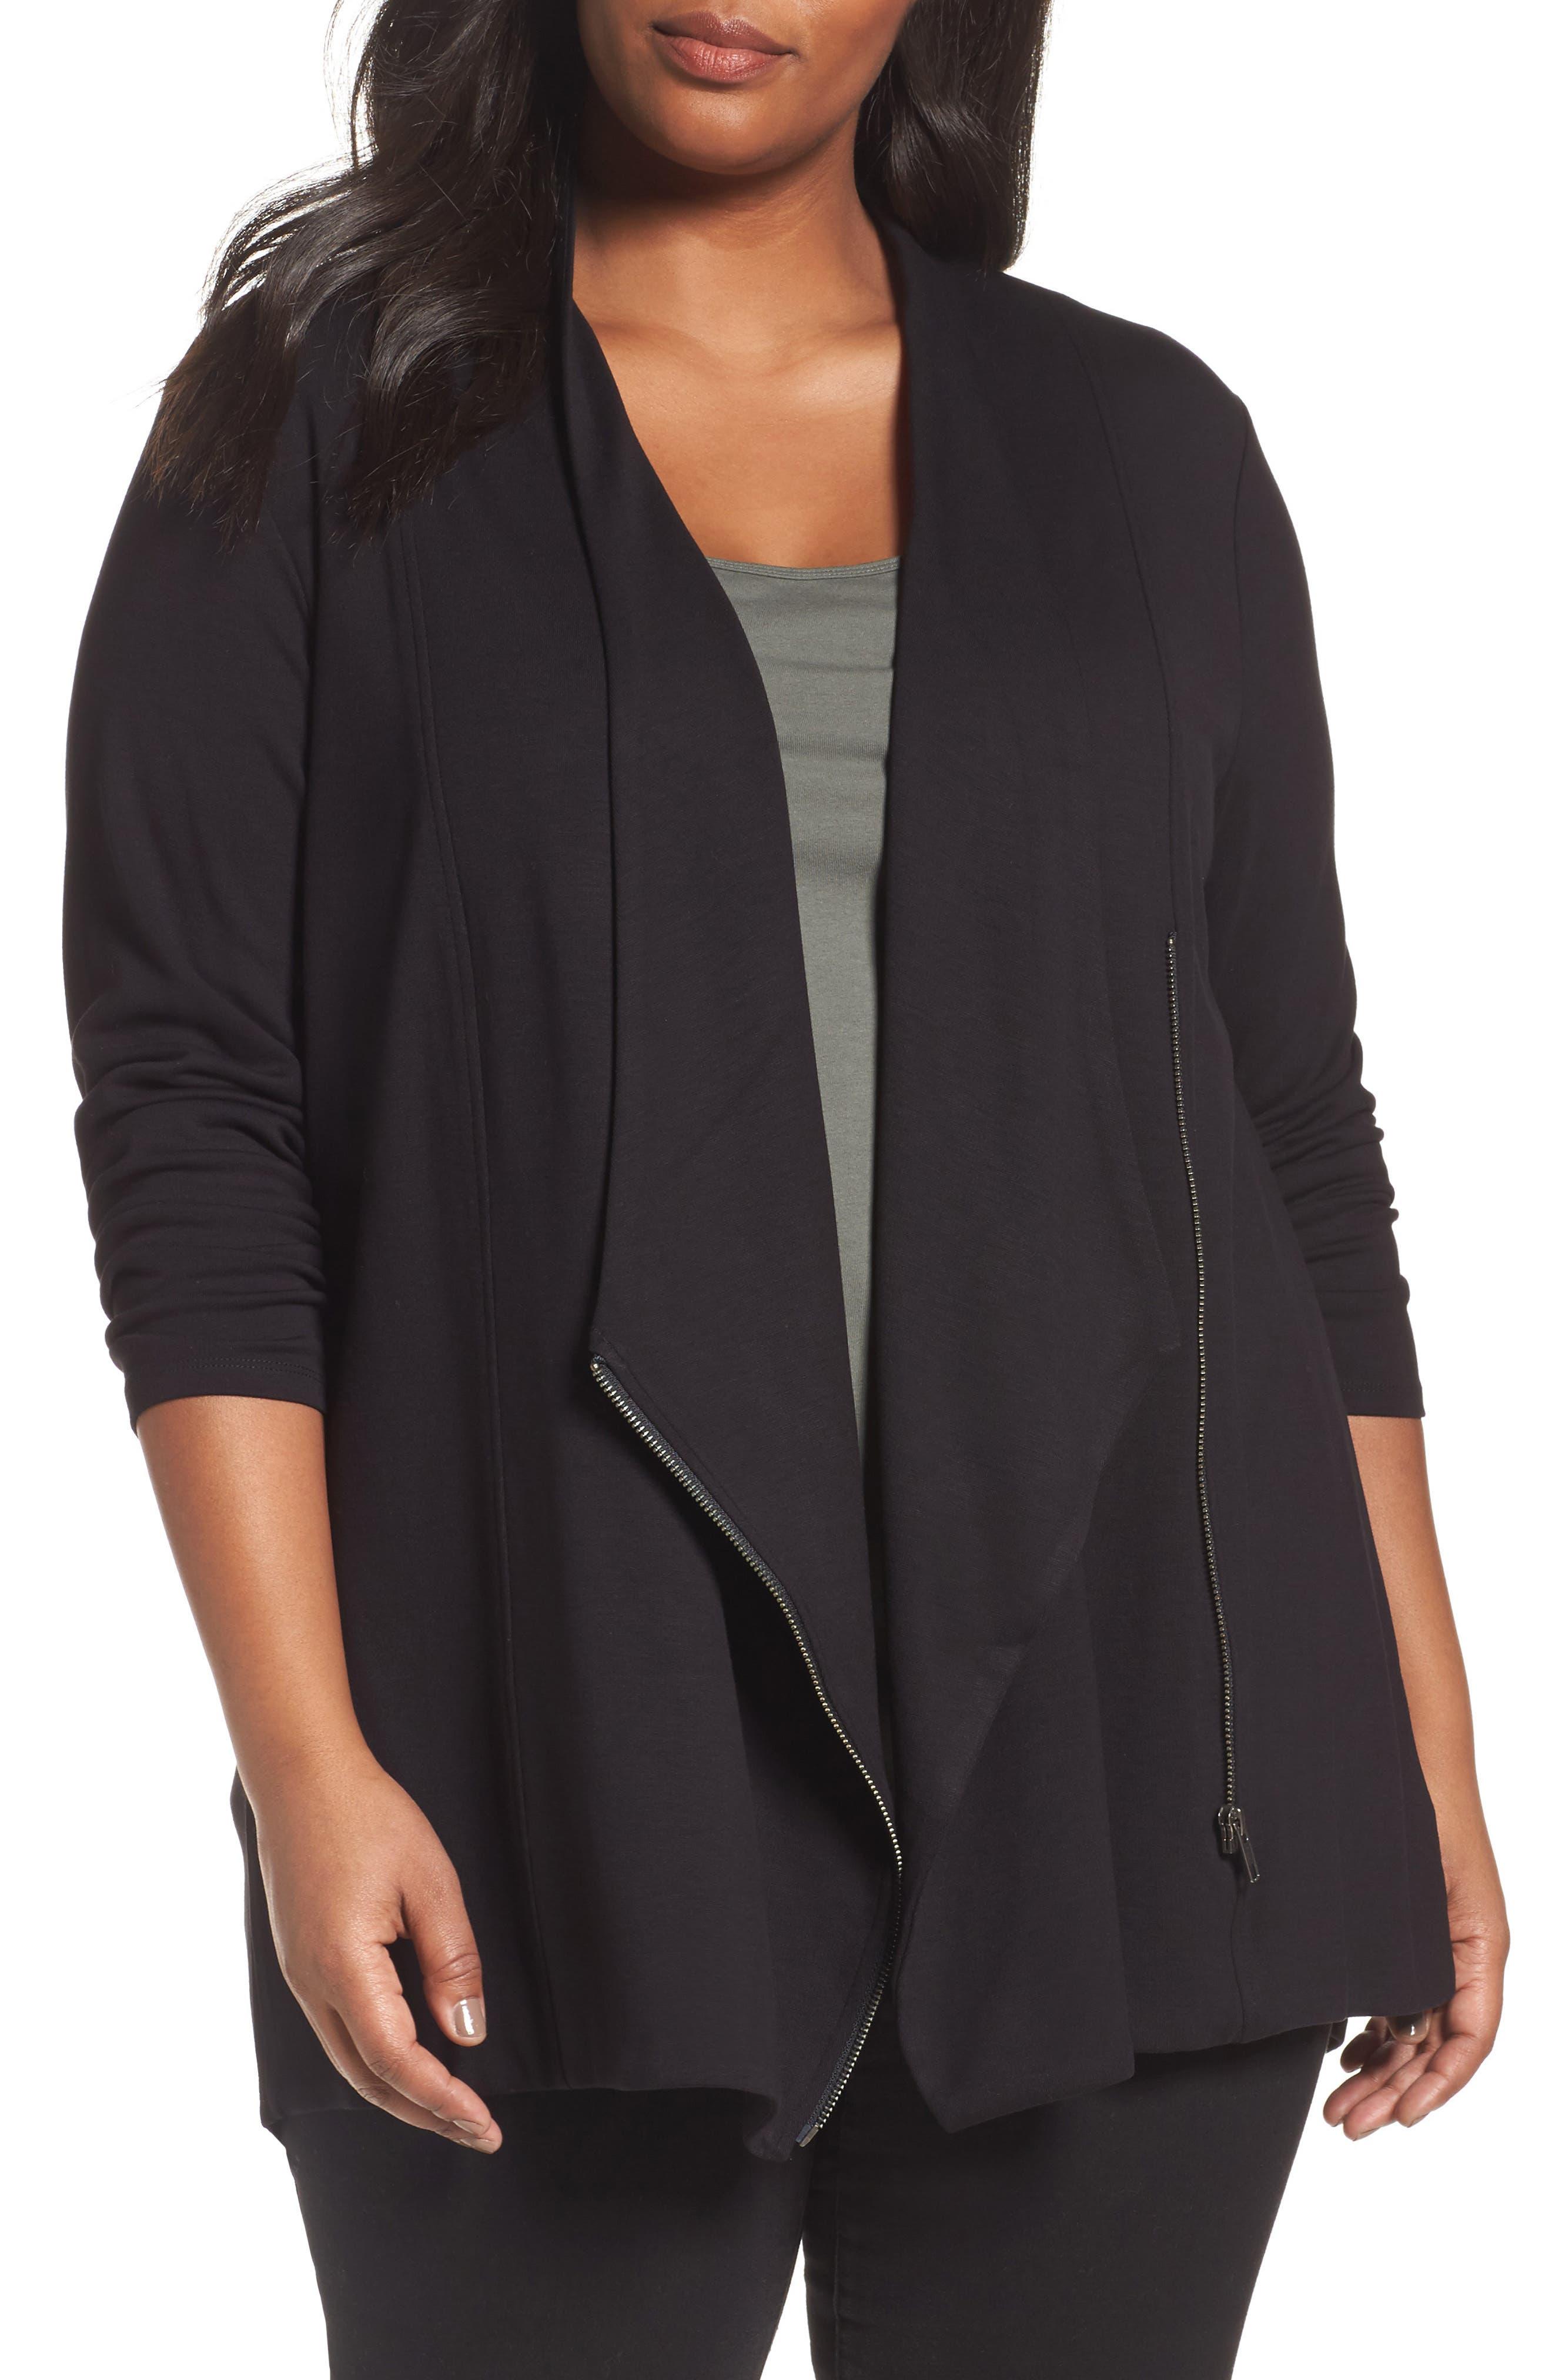 Alternate Image 1 Selected - NIC+ZOE Studio Asymmetrical Zip Jacket (Plus Size)